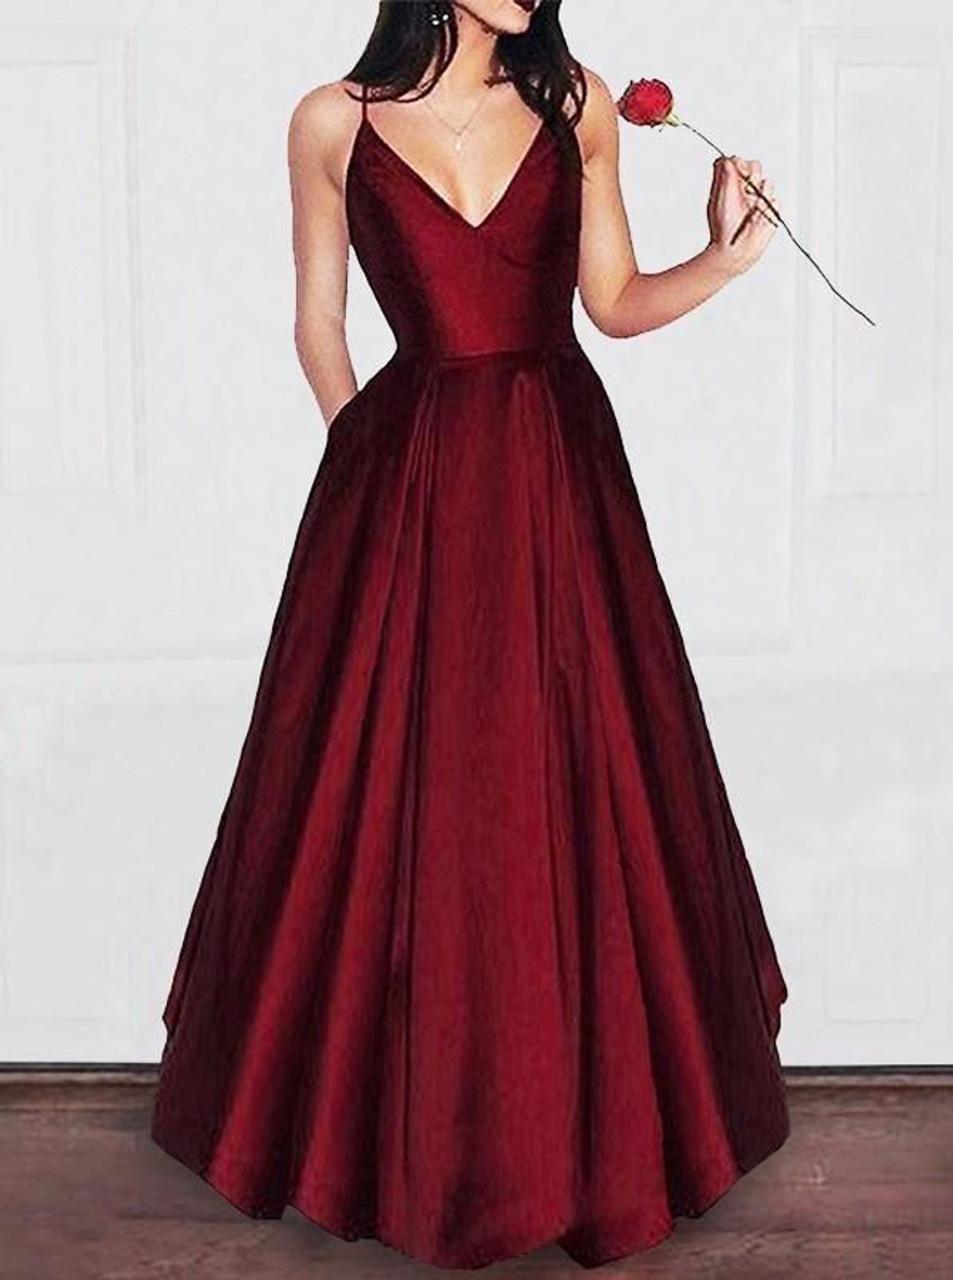 0b115e29b5f Burgundy Simple Prom Dresses